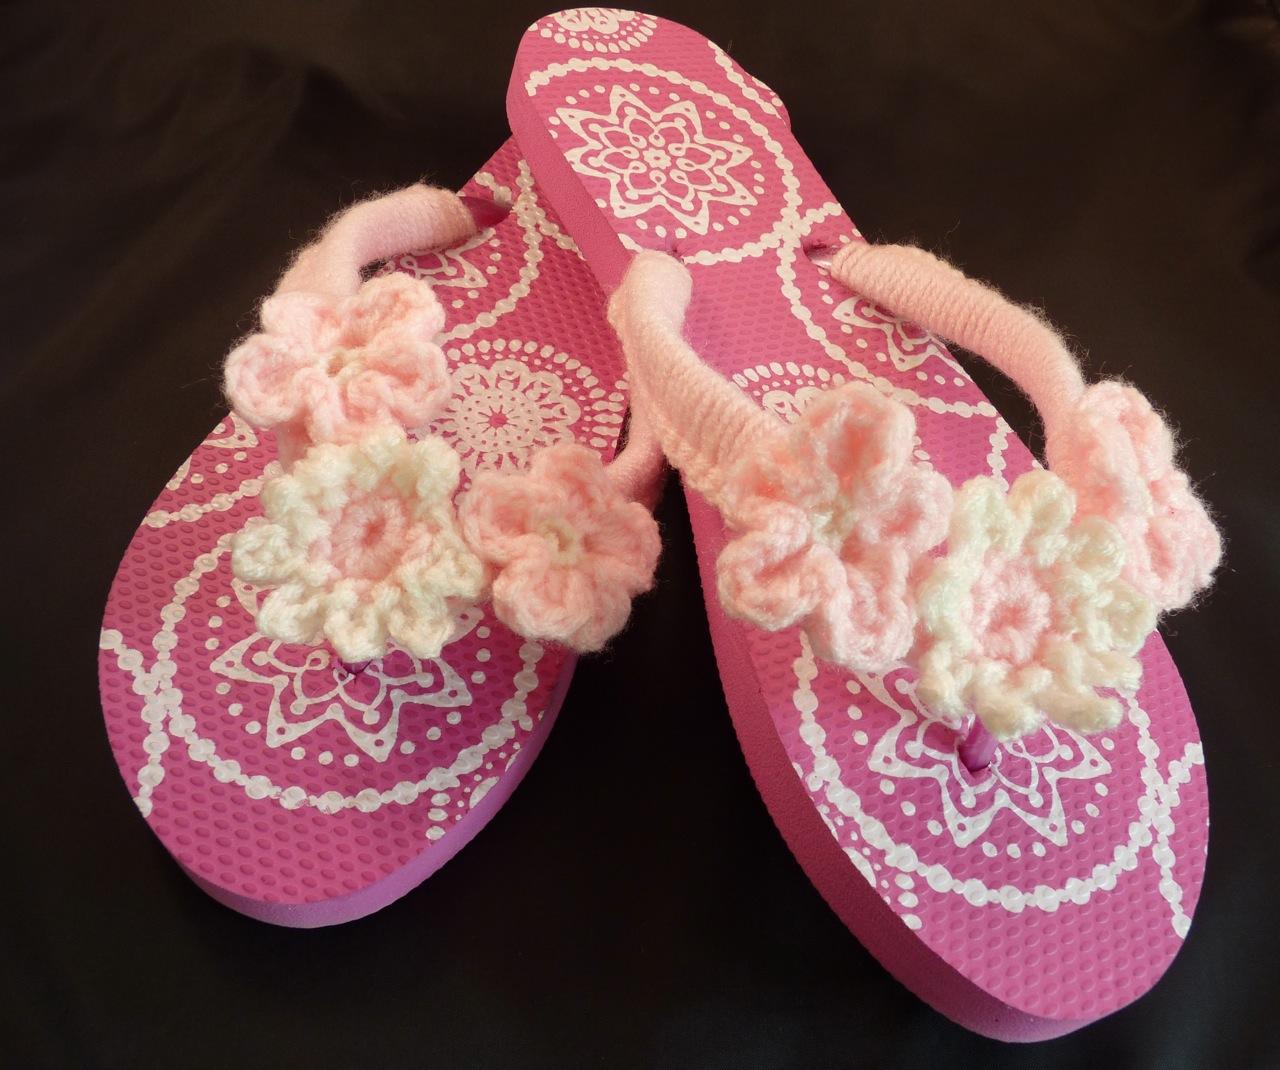 Crochet-Embellished Flip Flops Bake with Jill